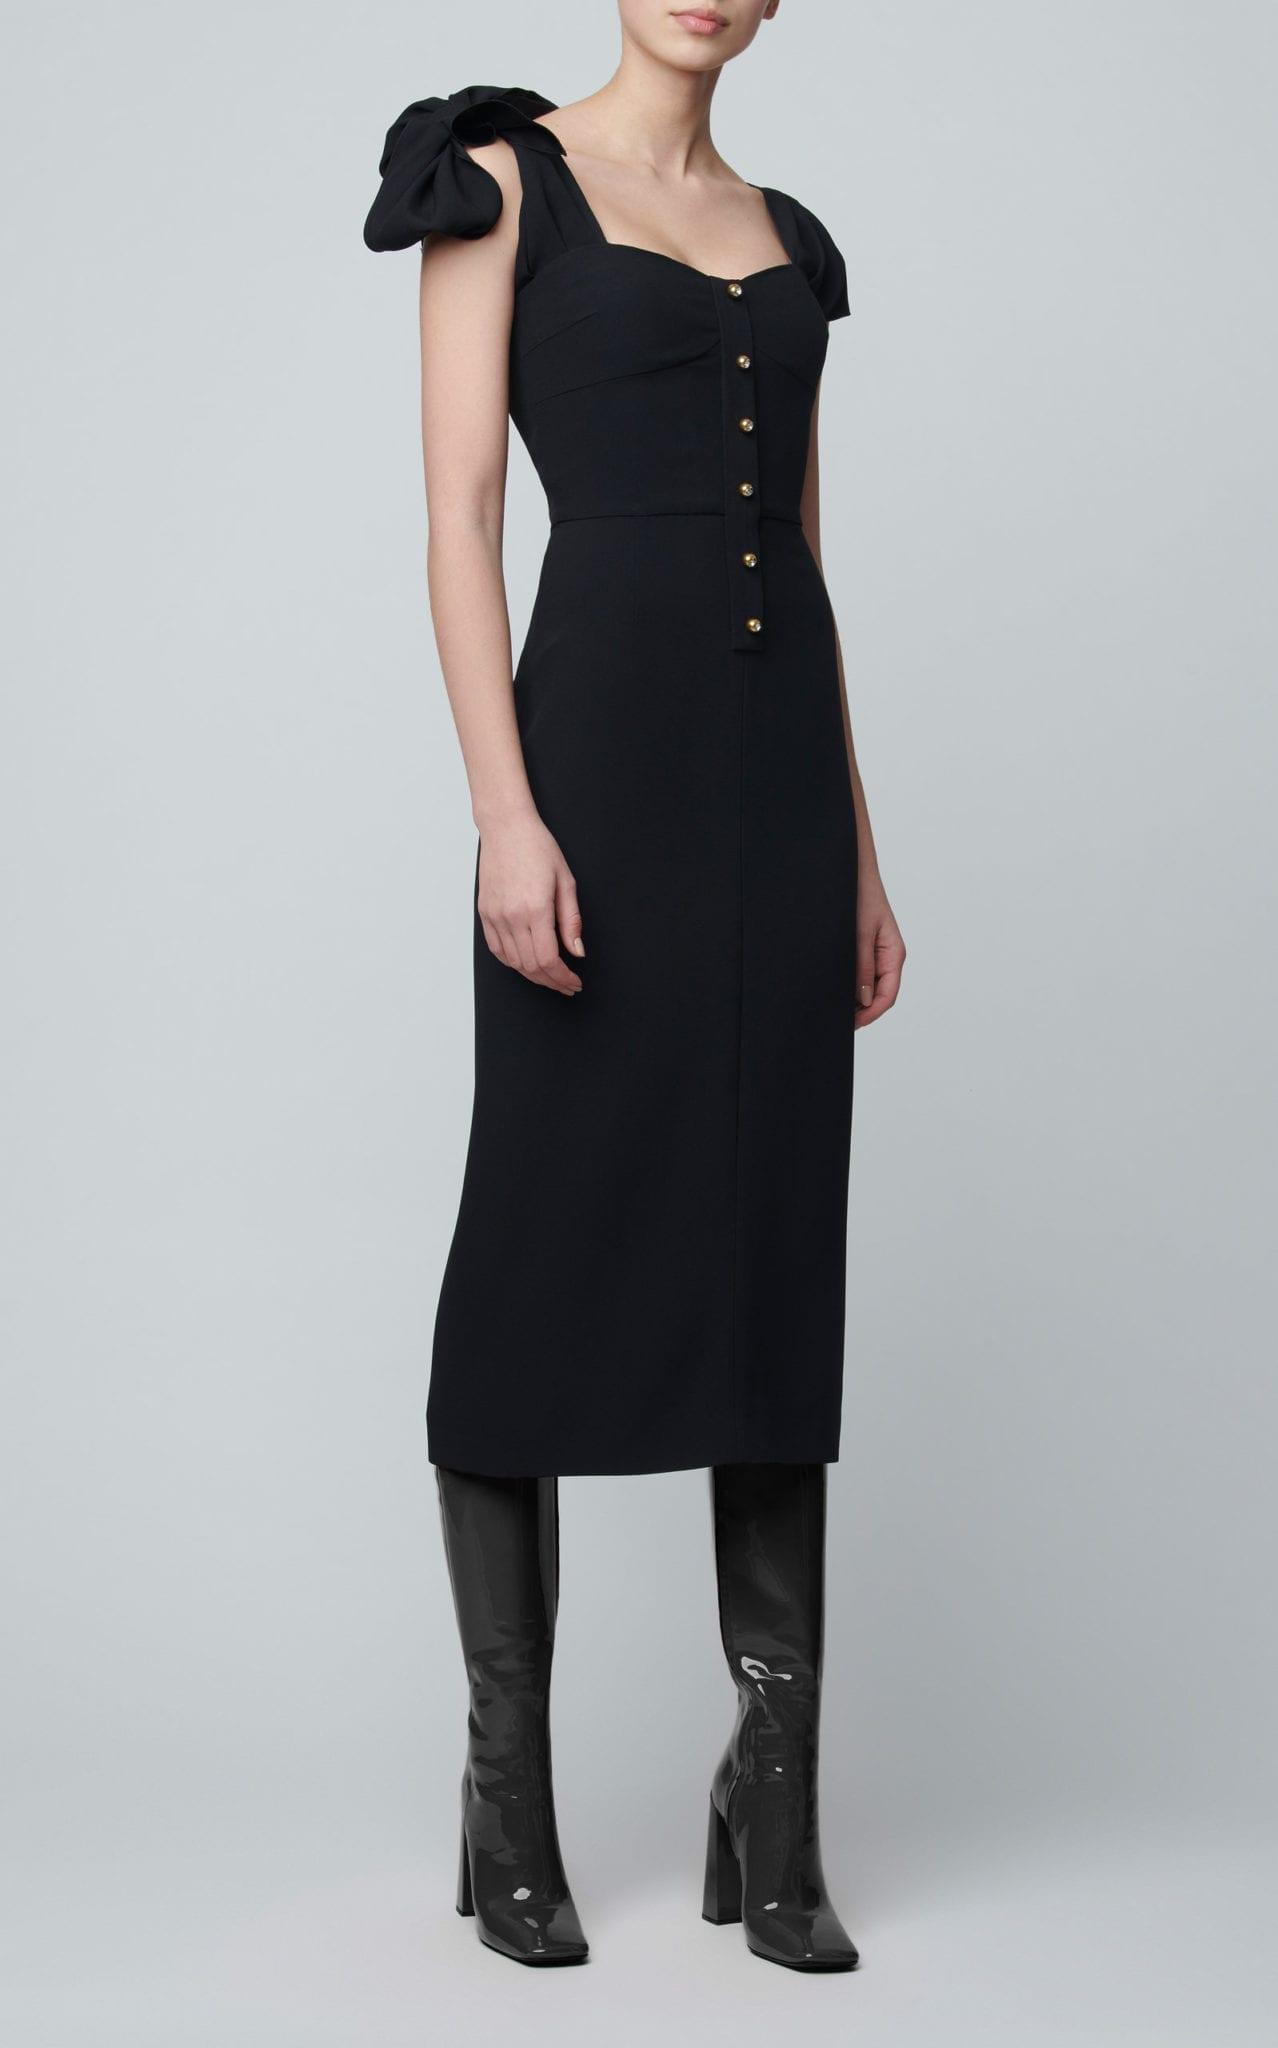 PRADA Tie-Detailed Satin-Crepe Midi Dress